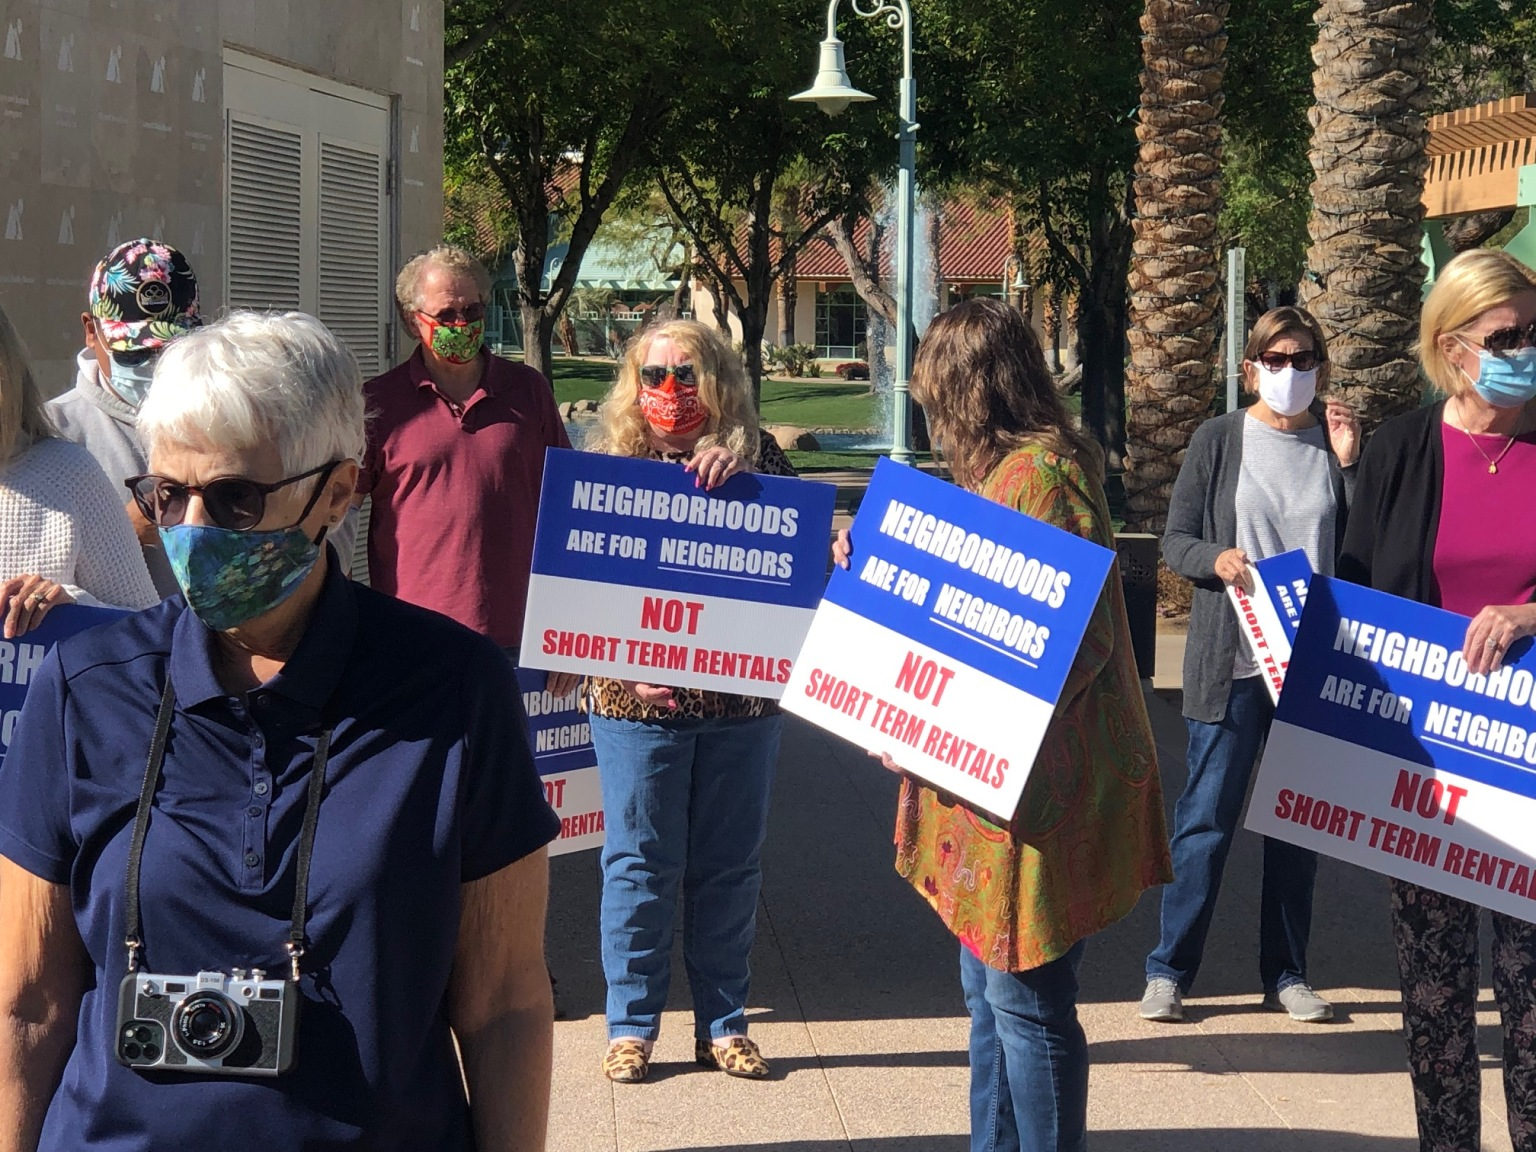 La Quinta Residents Request Extension on Short Term Vacation Rental Moratorium